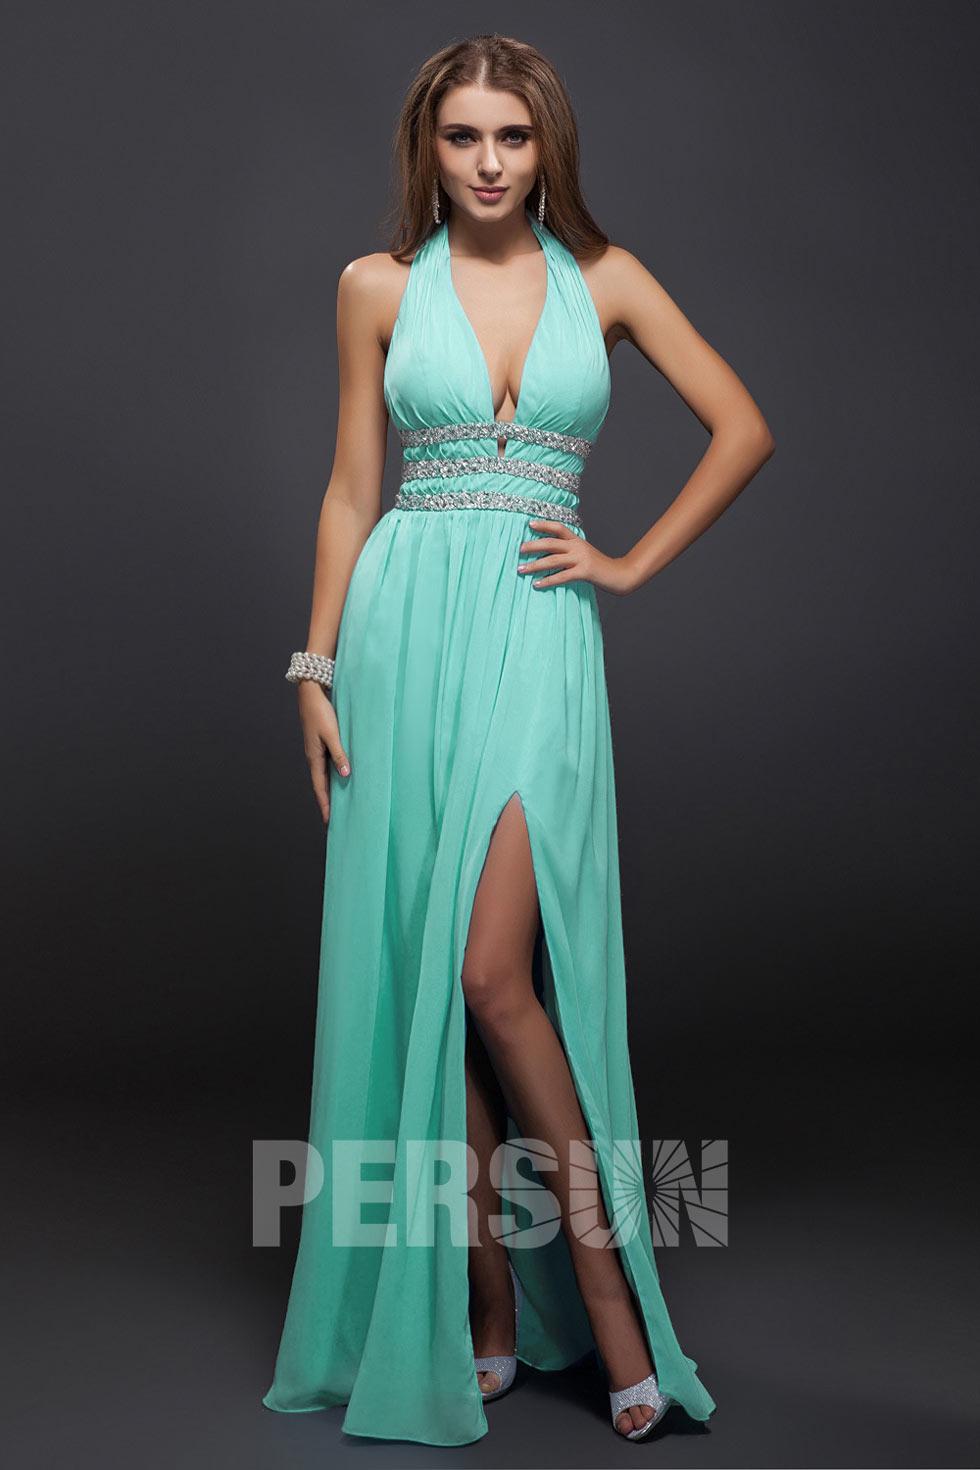 robe turquoise longue fendue halter dos nu